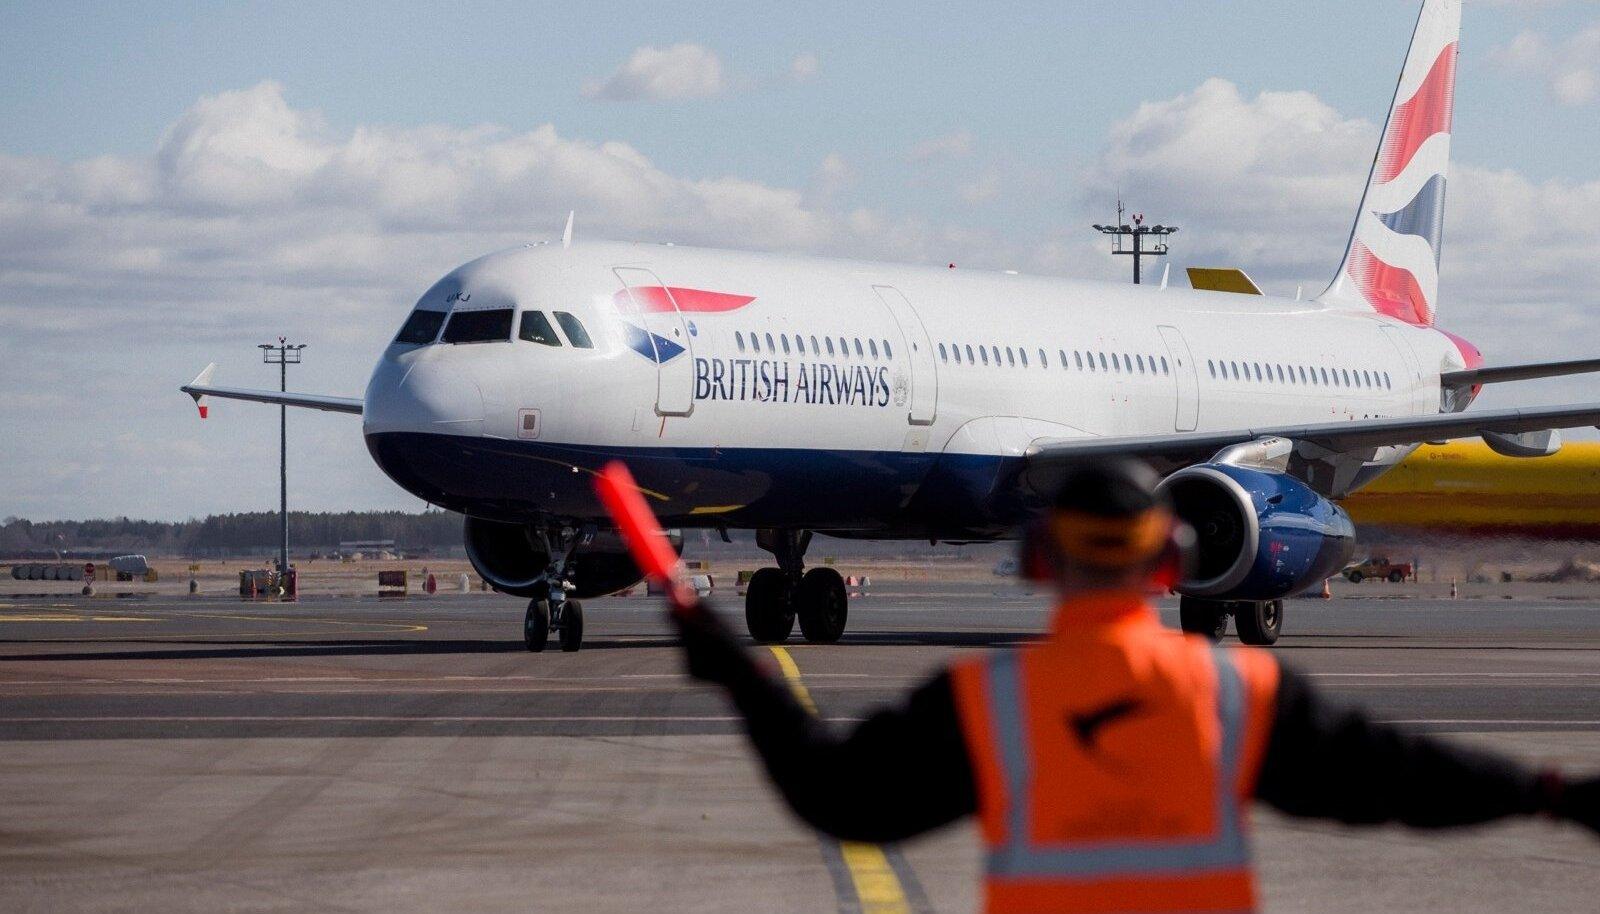 British Airways esimene lend Tallinnas